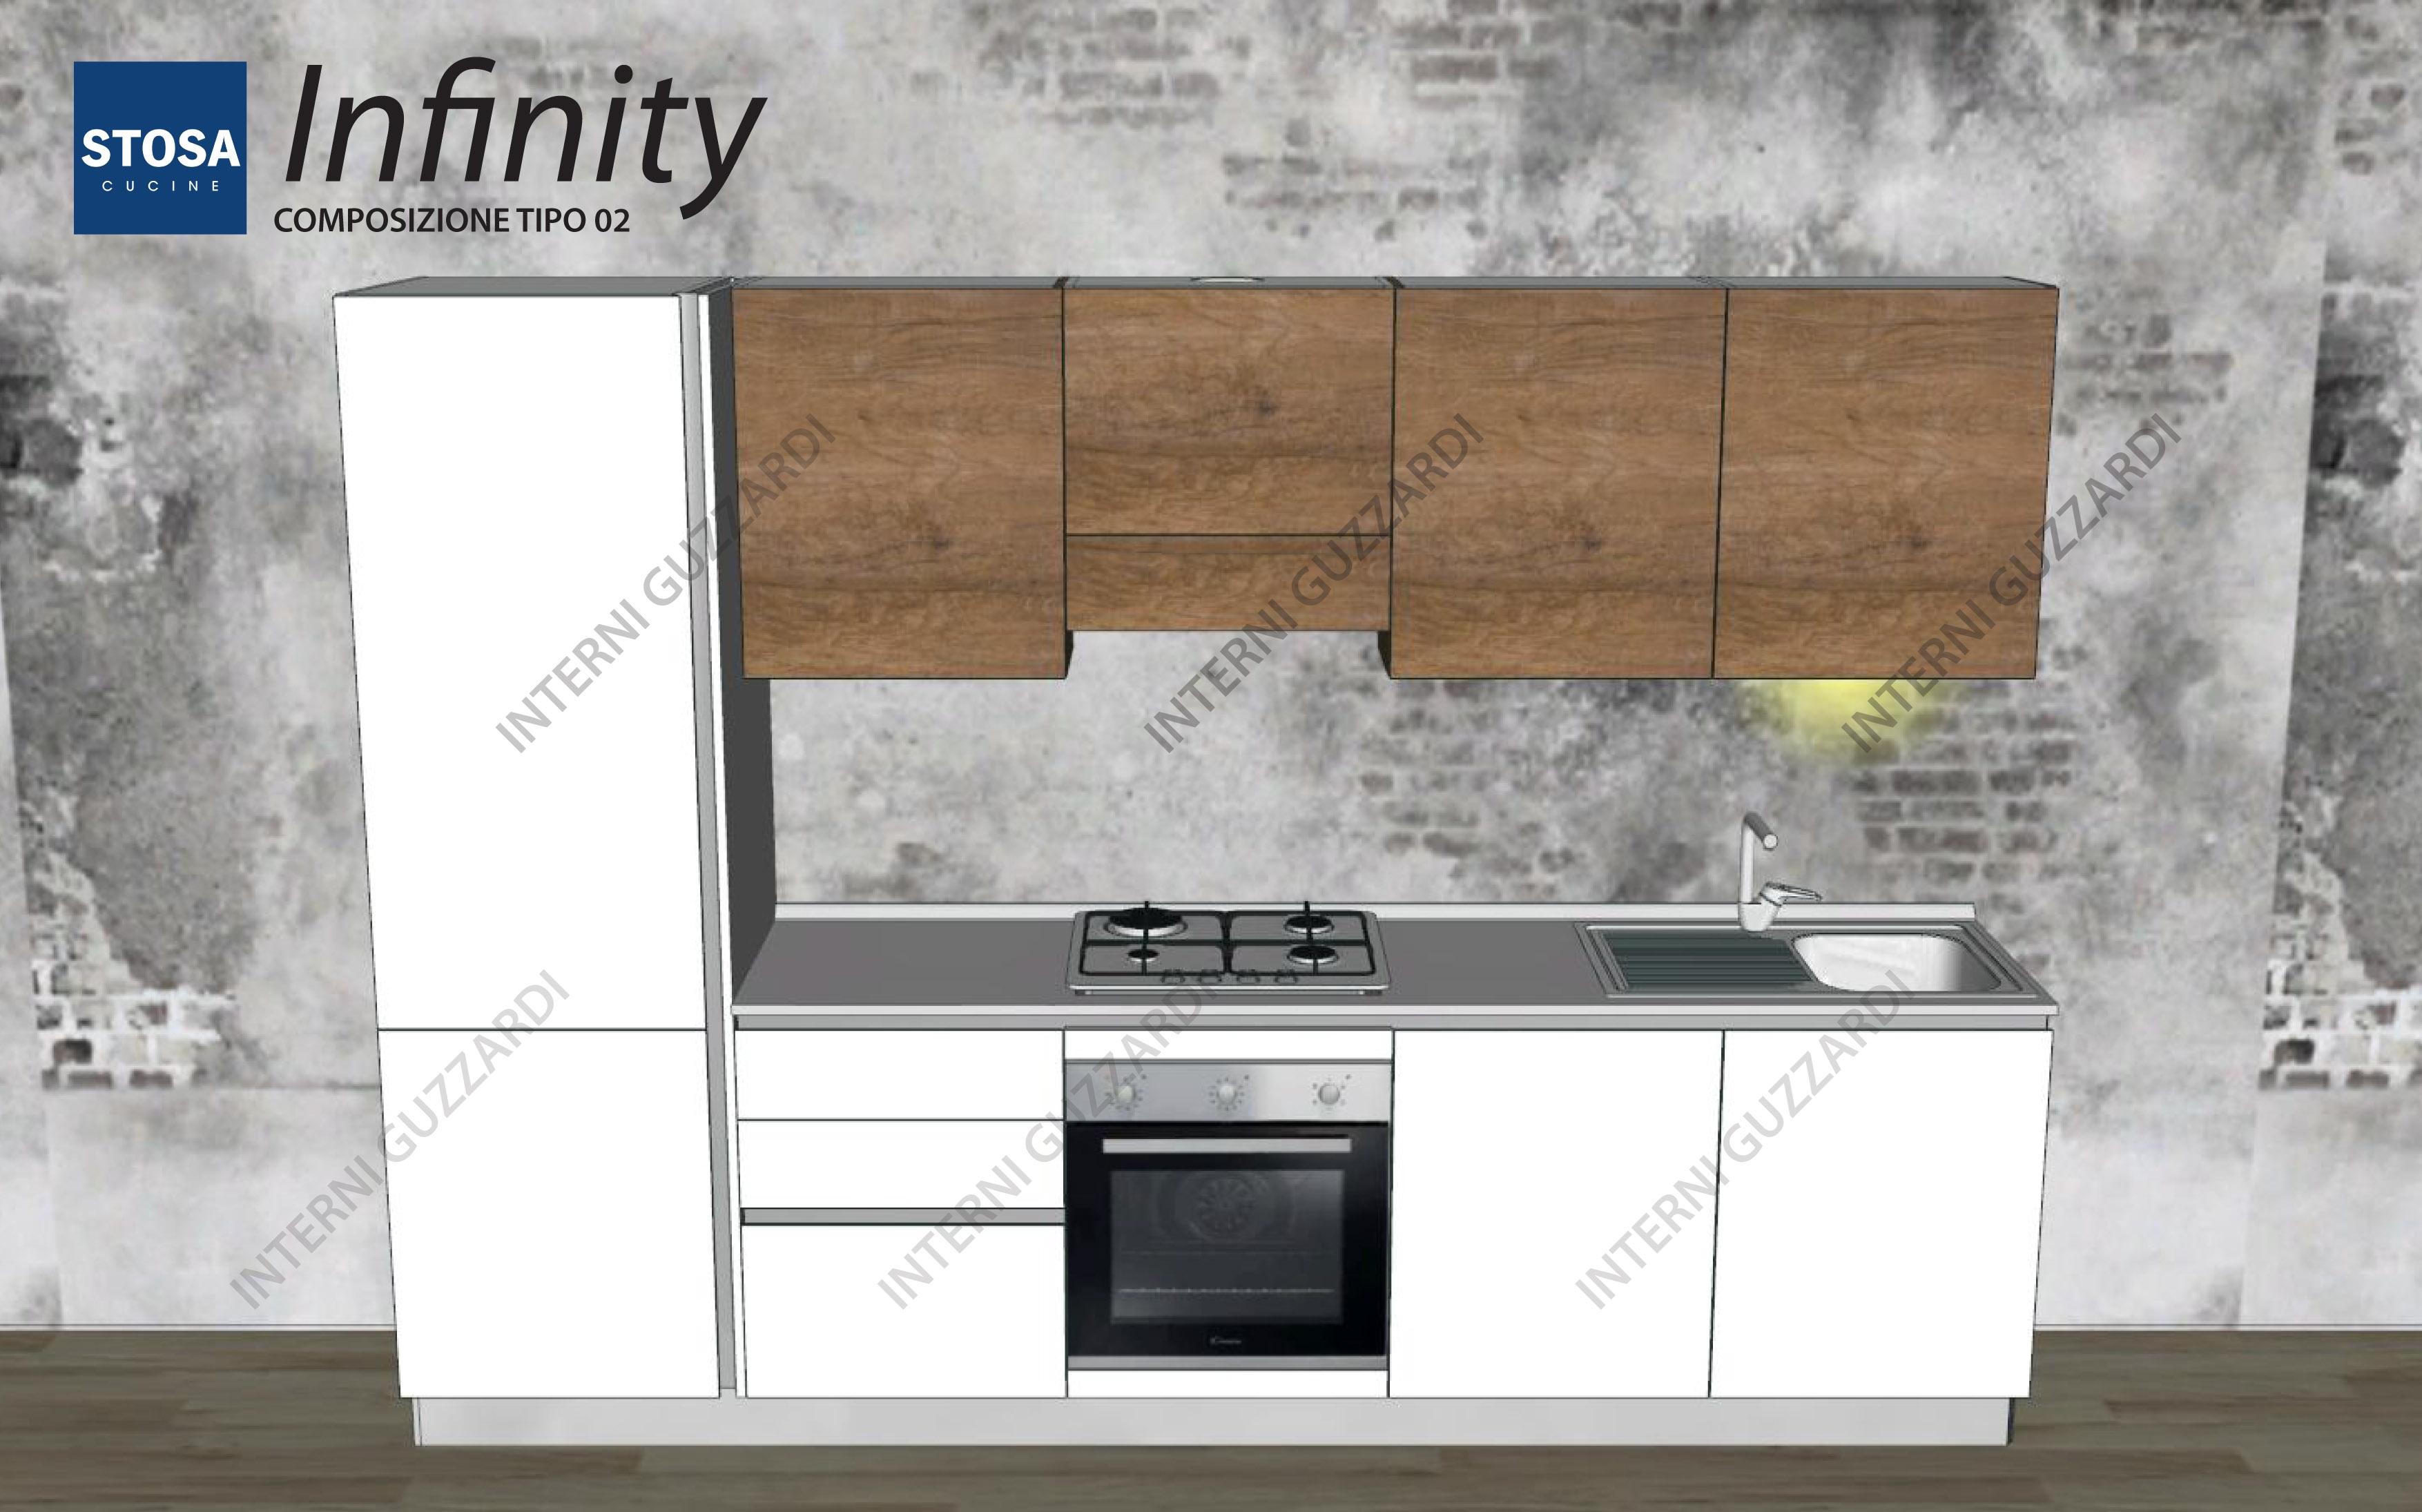 cucina stosa cucine infinity composizione tipo 02 a 520000